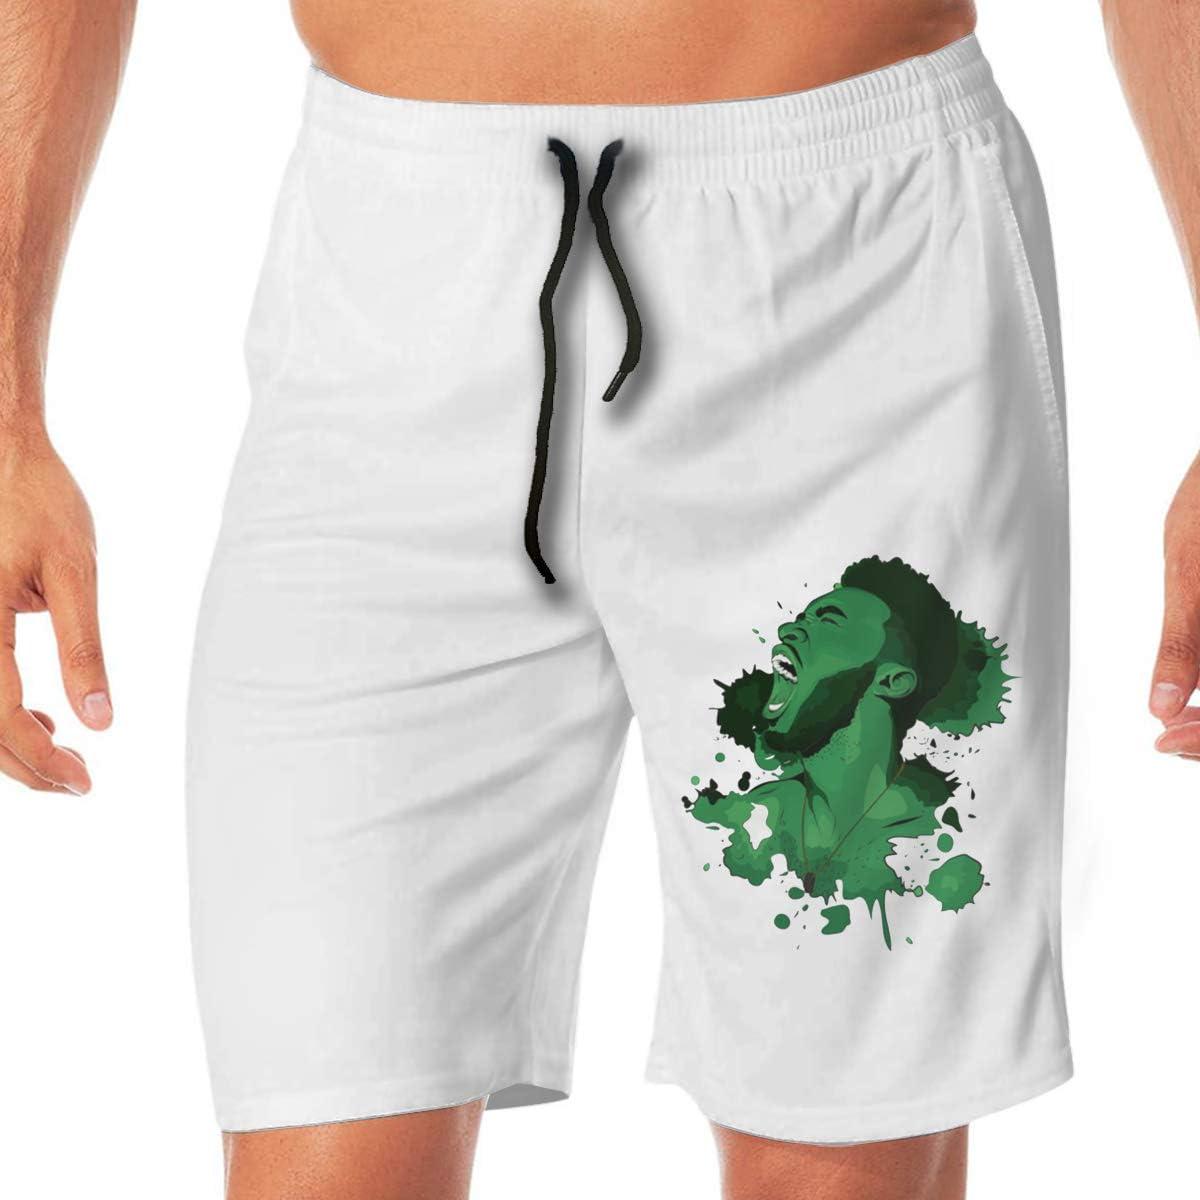 Reynoldss Caraaed Mens Jay Brown Casual Sport Beach Shorts Quick-Dry Board Shorts